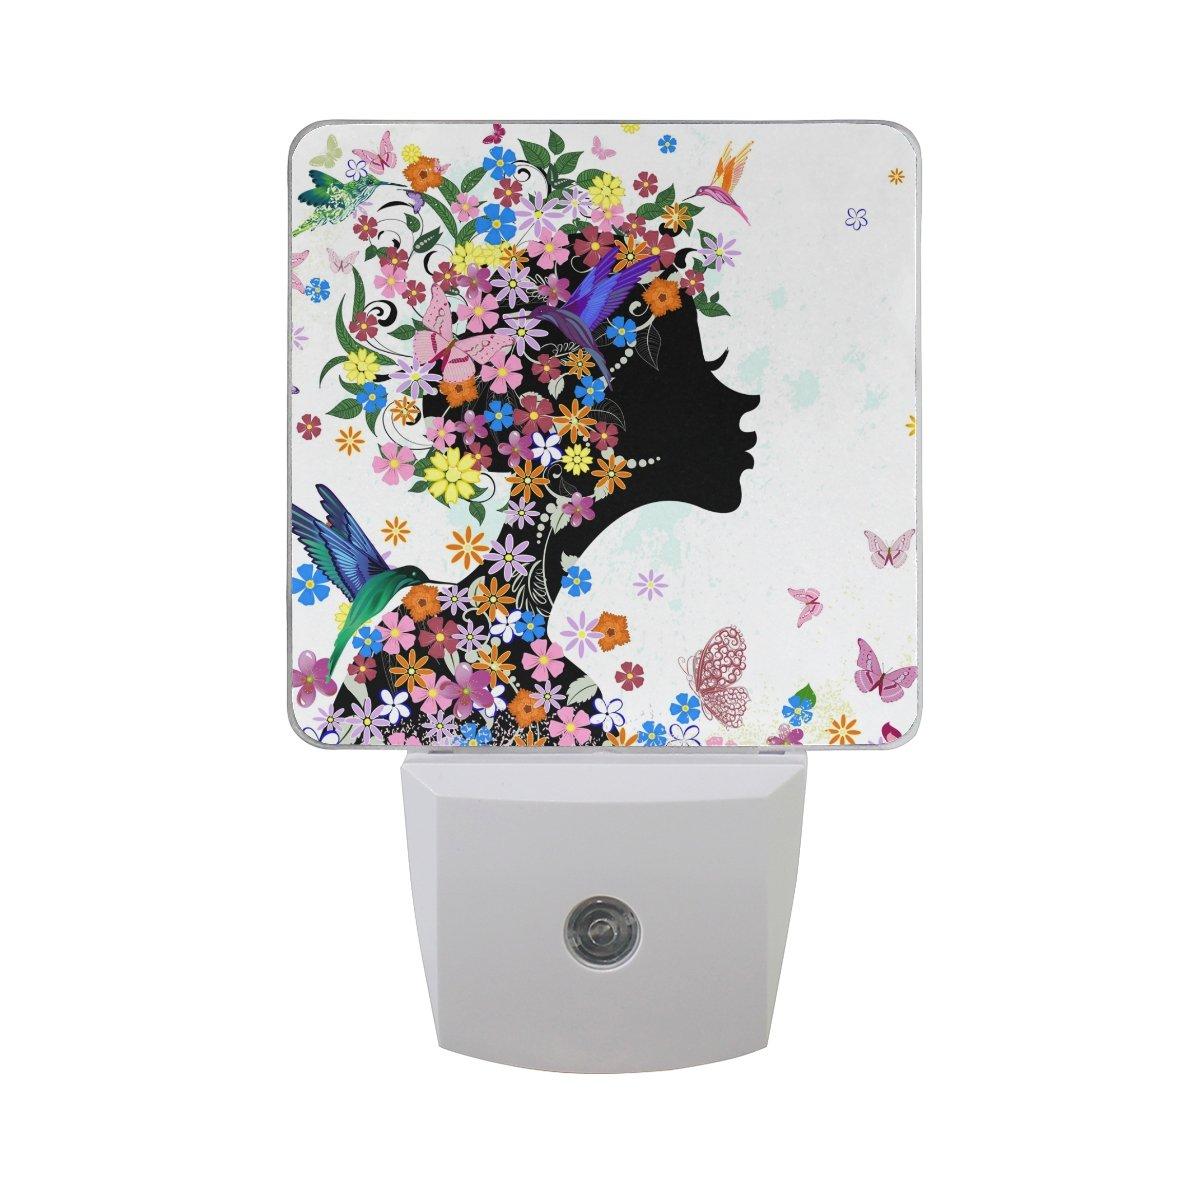 JOYPRINT Led Night Light Beautiful Girl Butterfly Flower, Auto Senor Dusk to Dawn Night Light Plug in for Kids Baby Girls Boys Adults Room